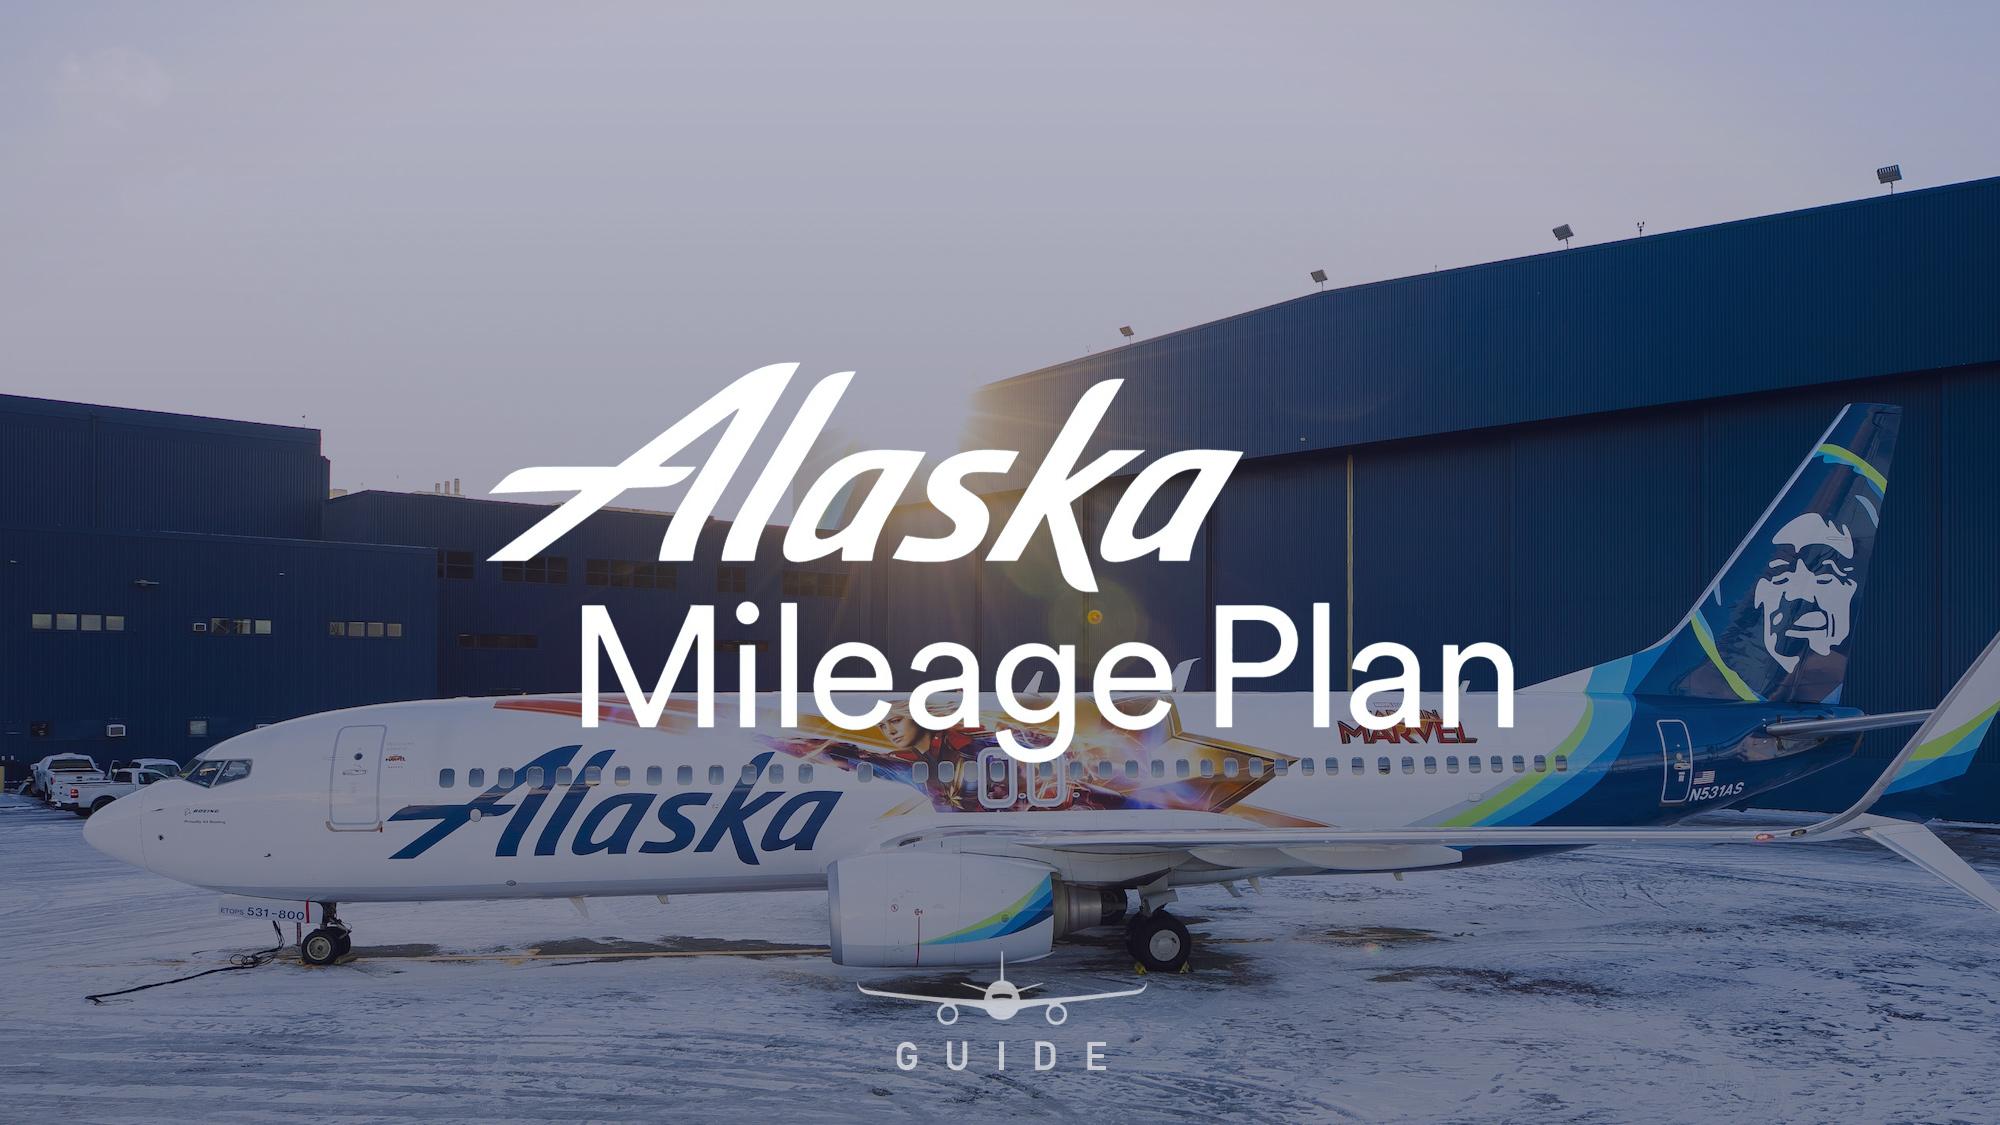 Alaska Plane tail